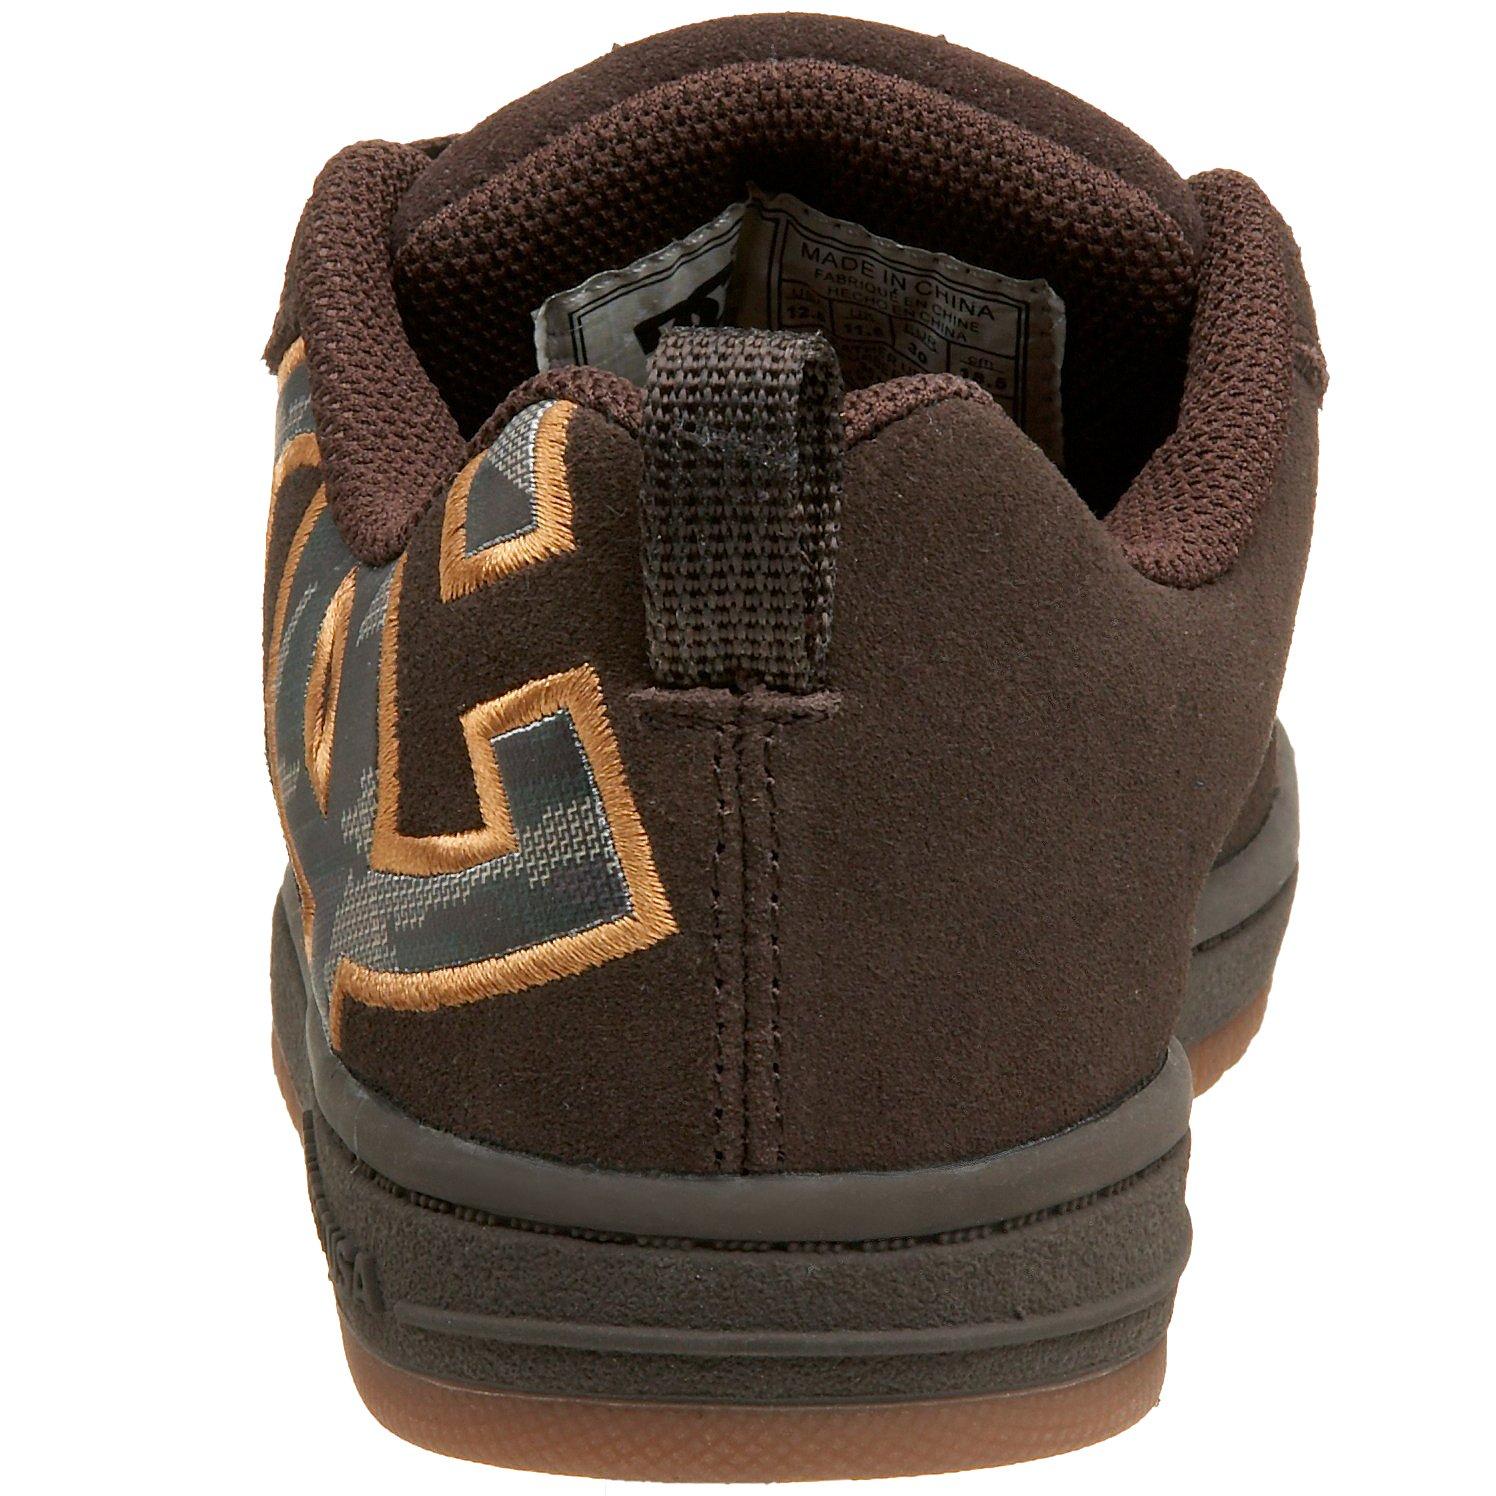 Toddler//Little Kid//Big Kid DC Kids Character Sneaker